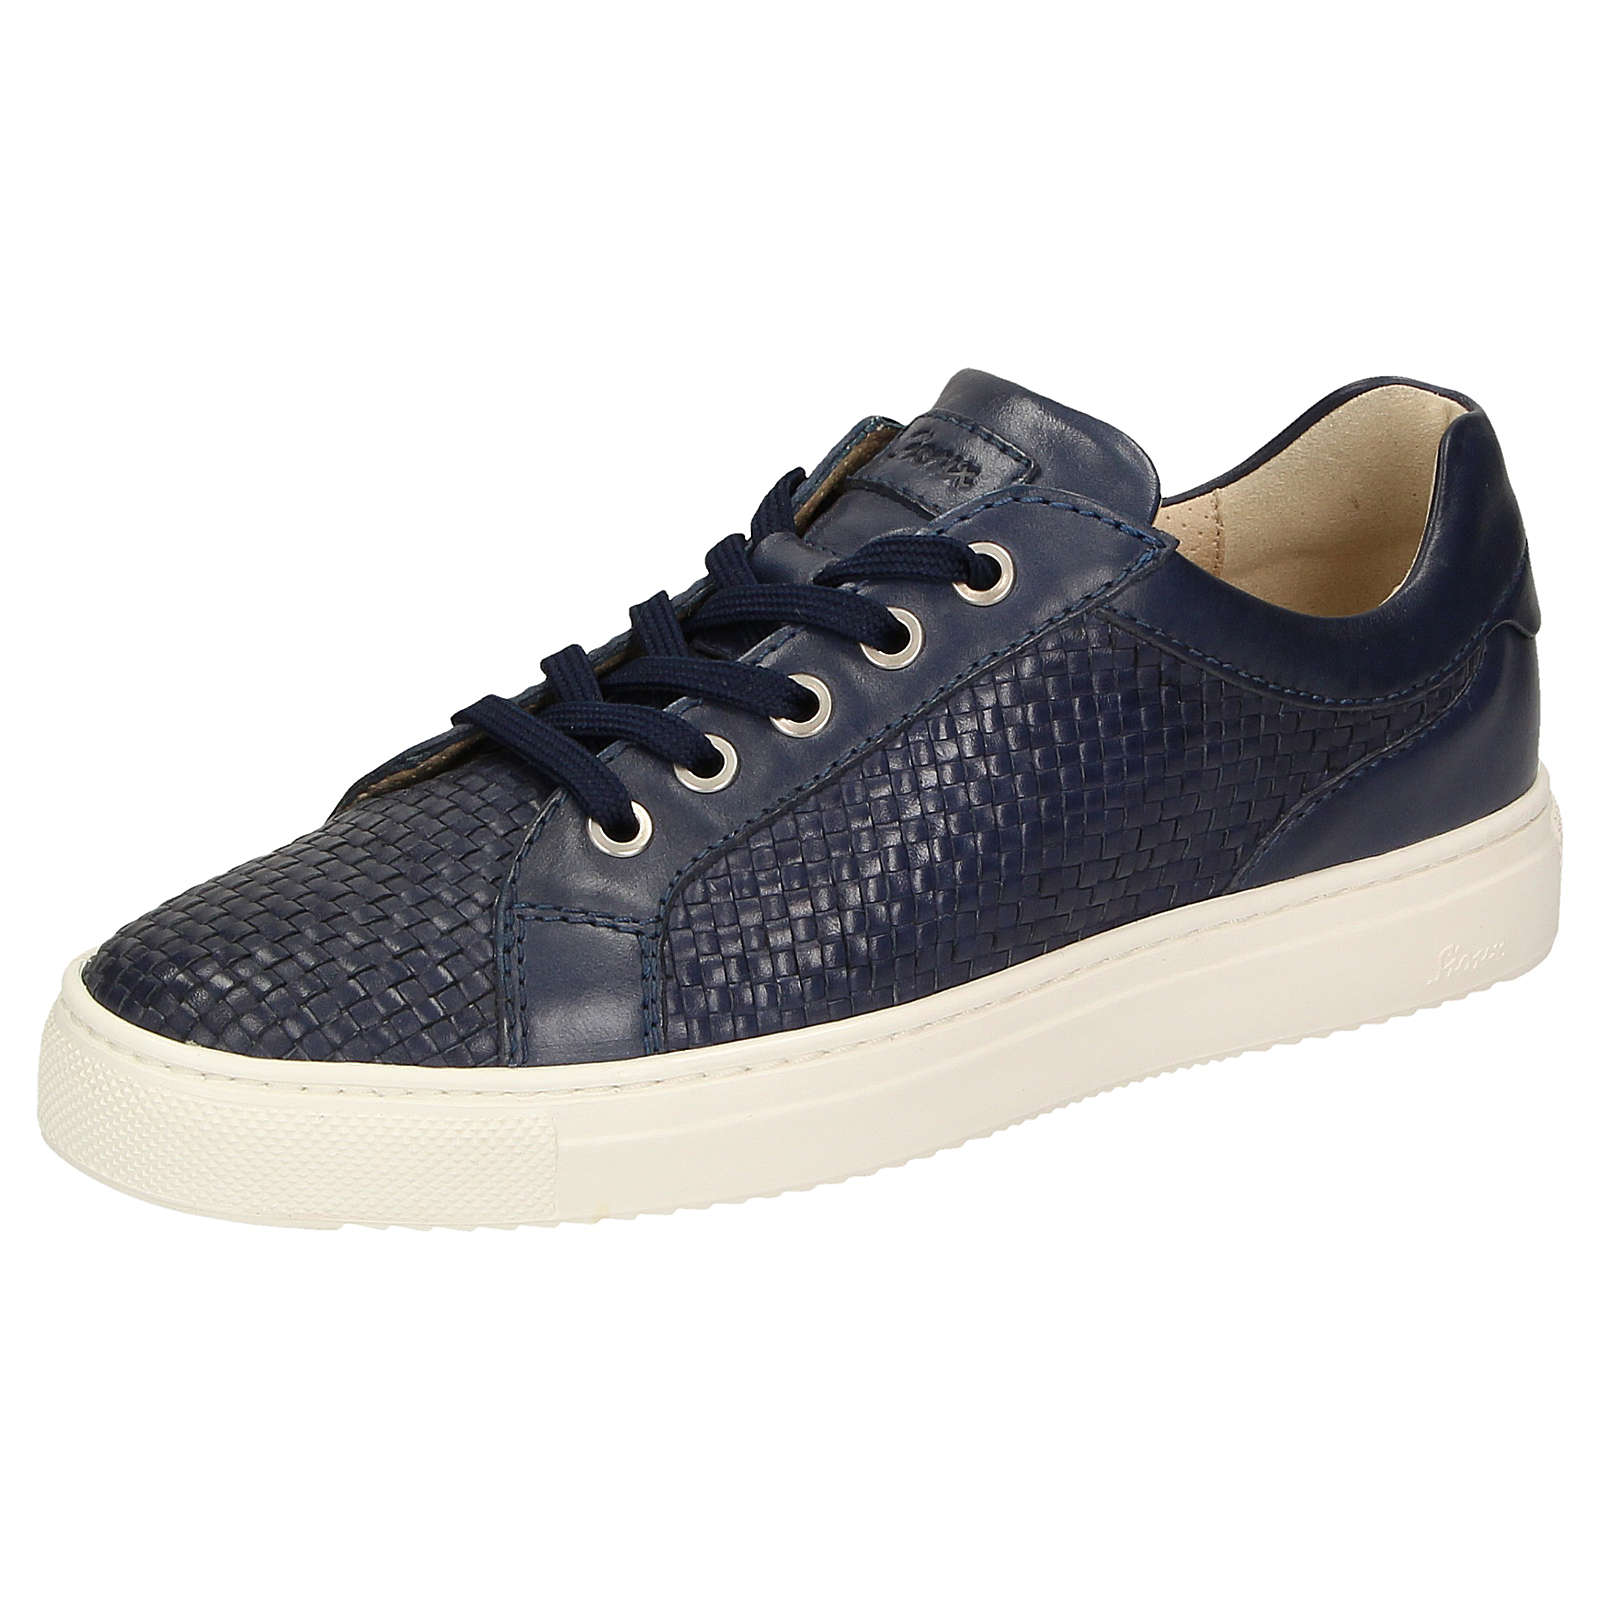 Sioux Sneaker Purvesia-701-XL Sneakers Low blau Damen Gr. 35